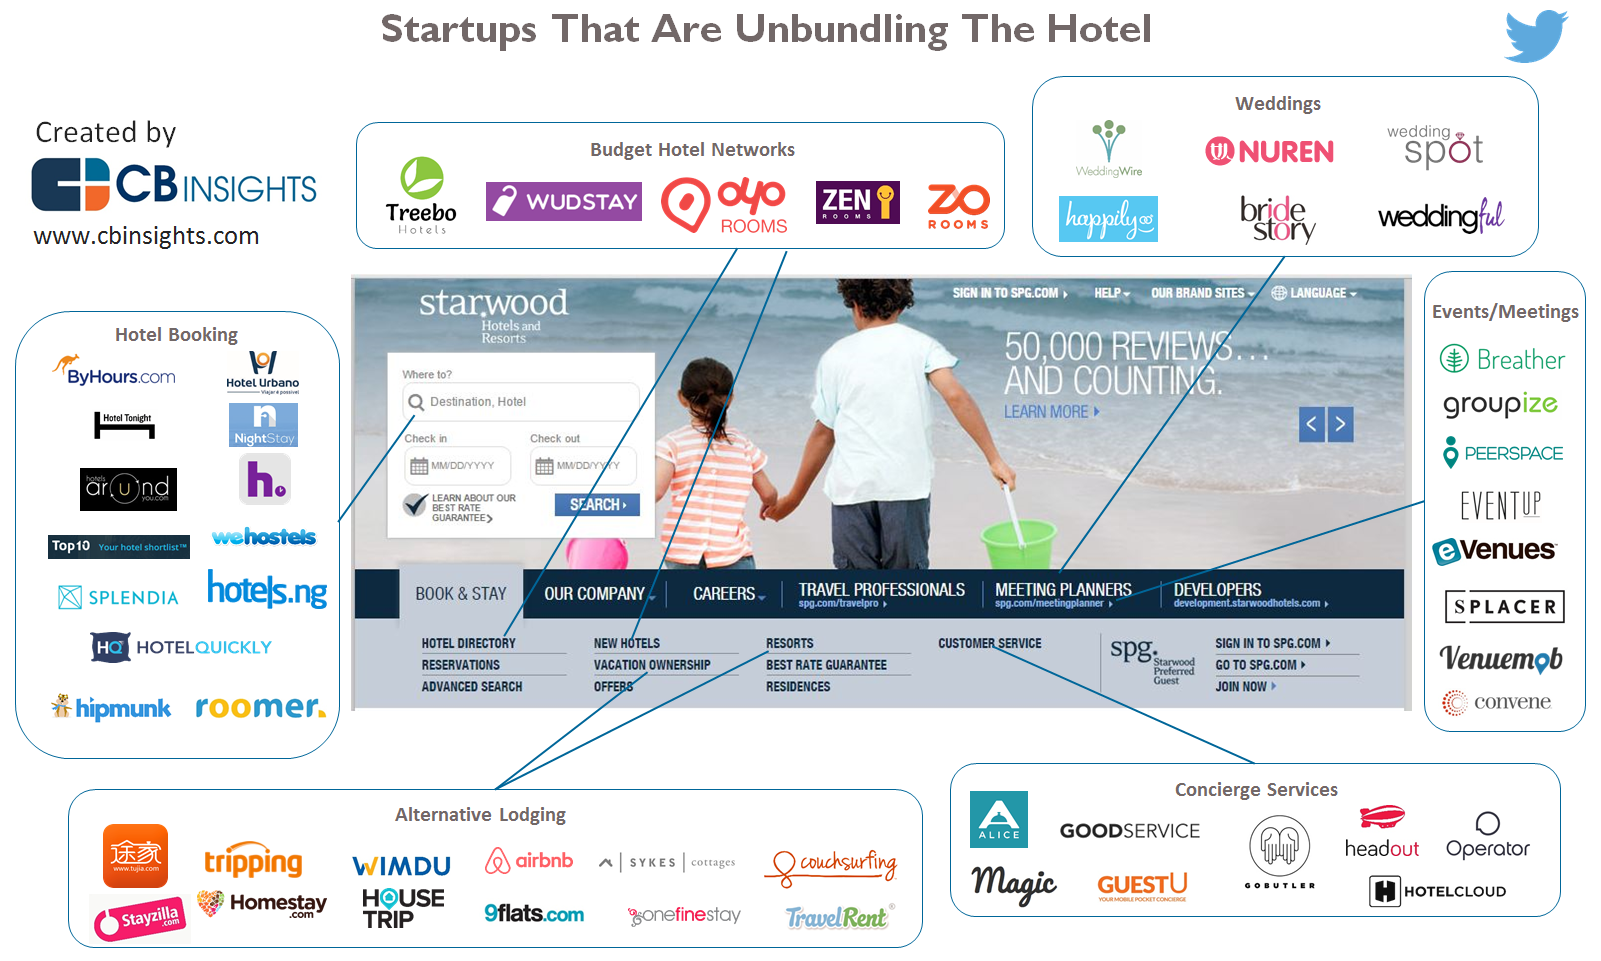 Unbundling the Hotel